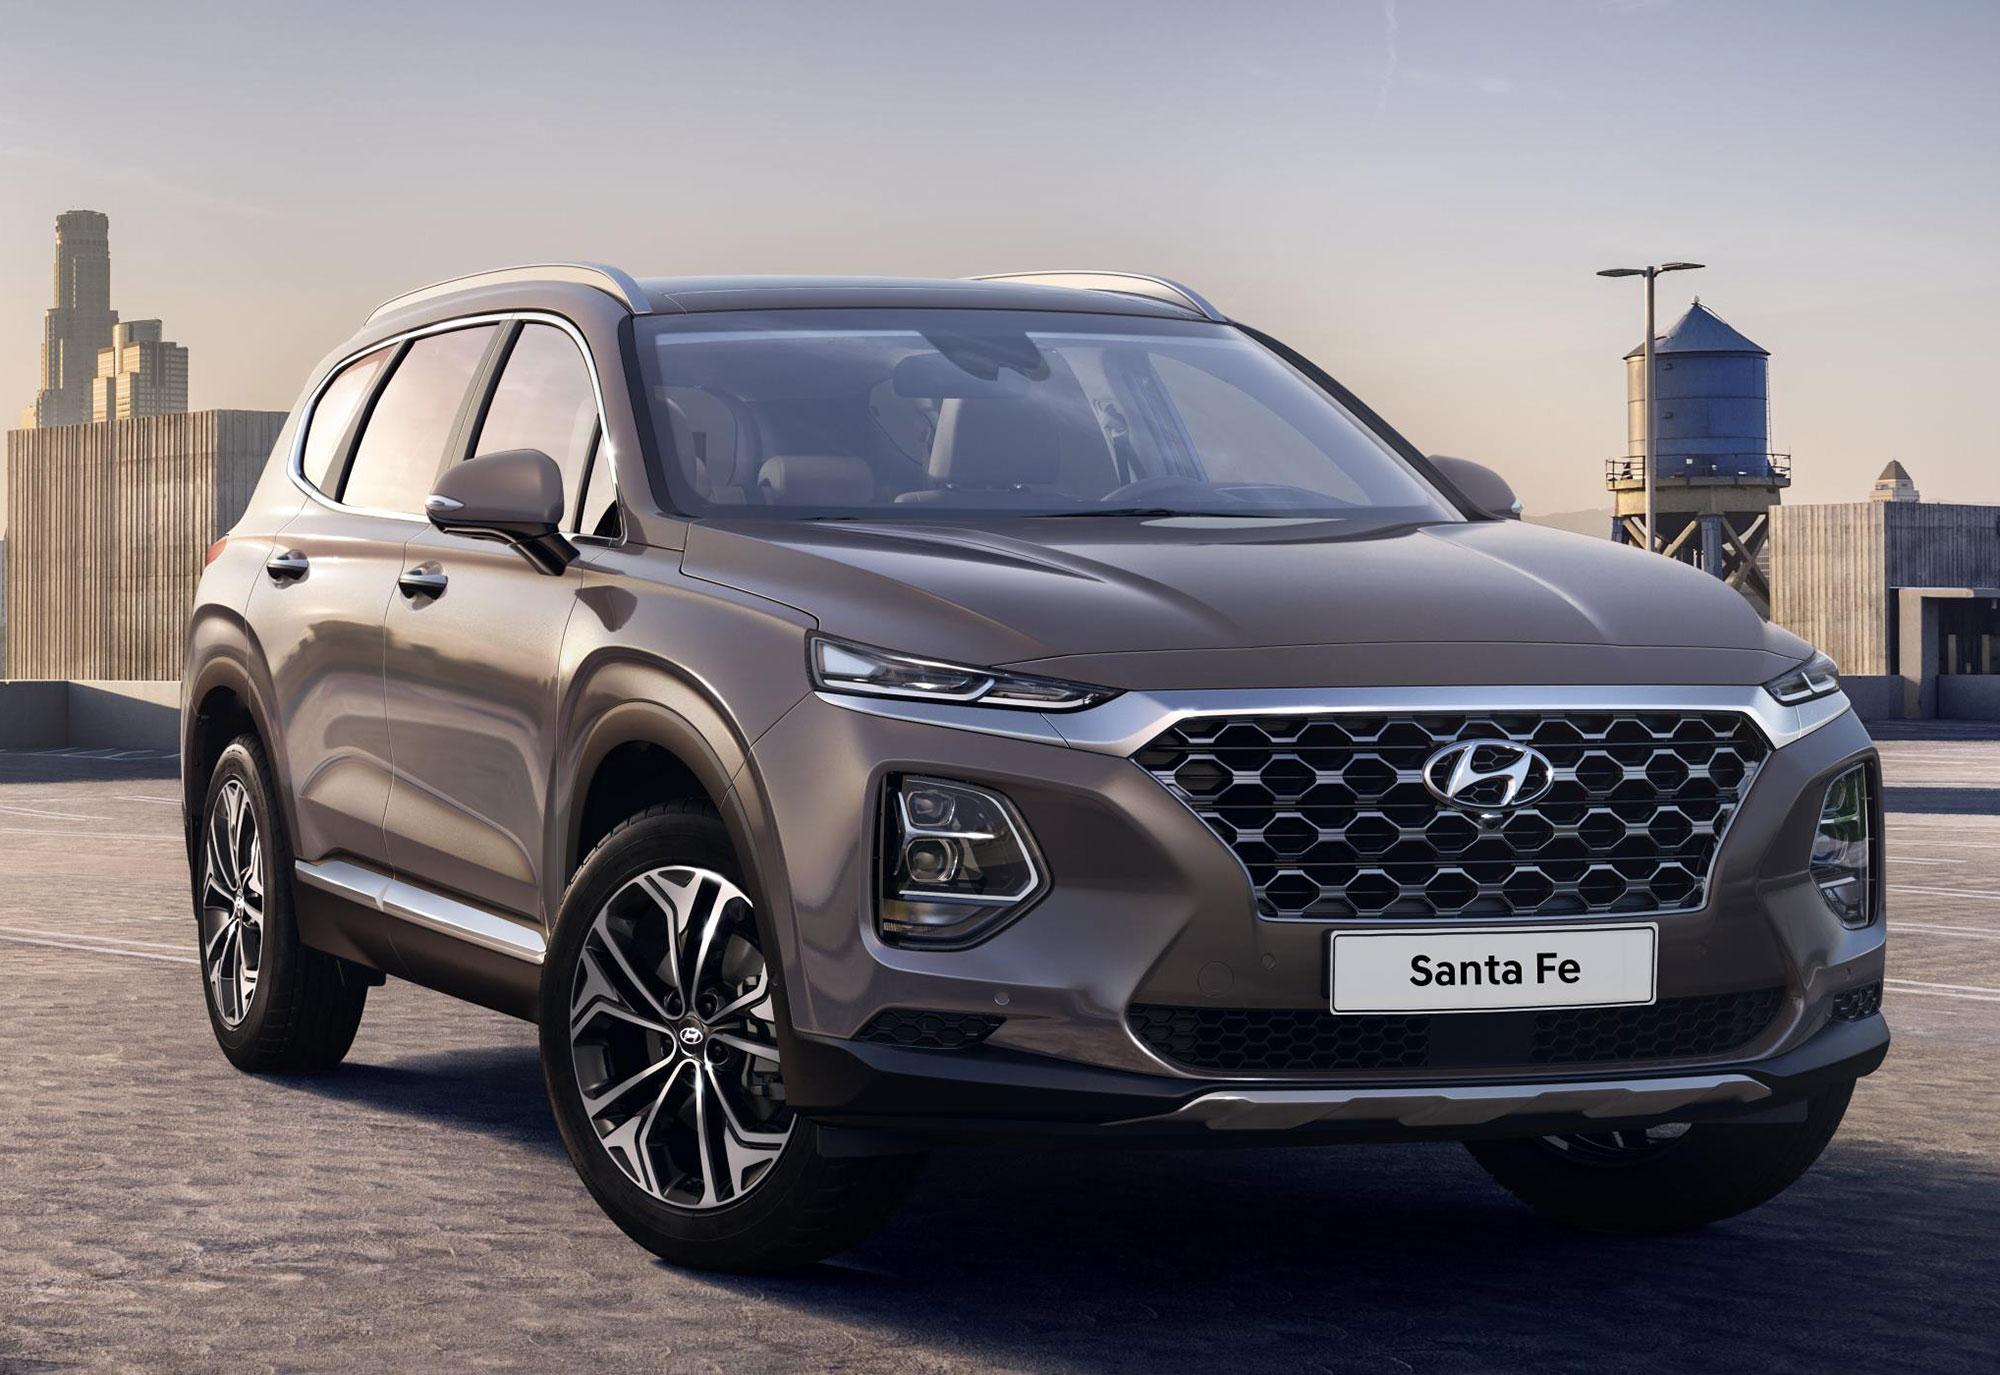 Hyundai_New-Santa-Fe-exterior.jpg